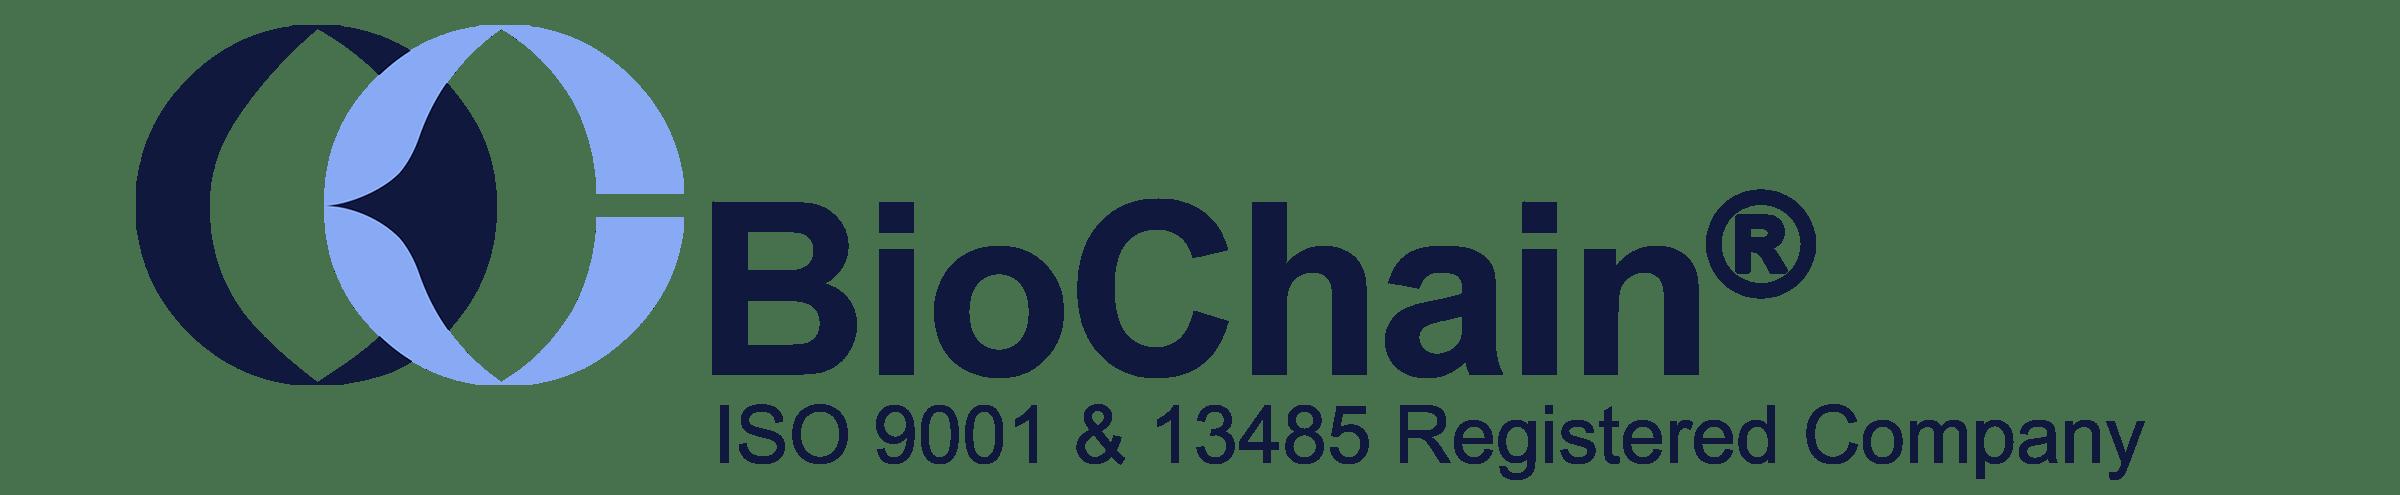 BioChain Institute company logo